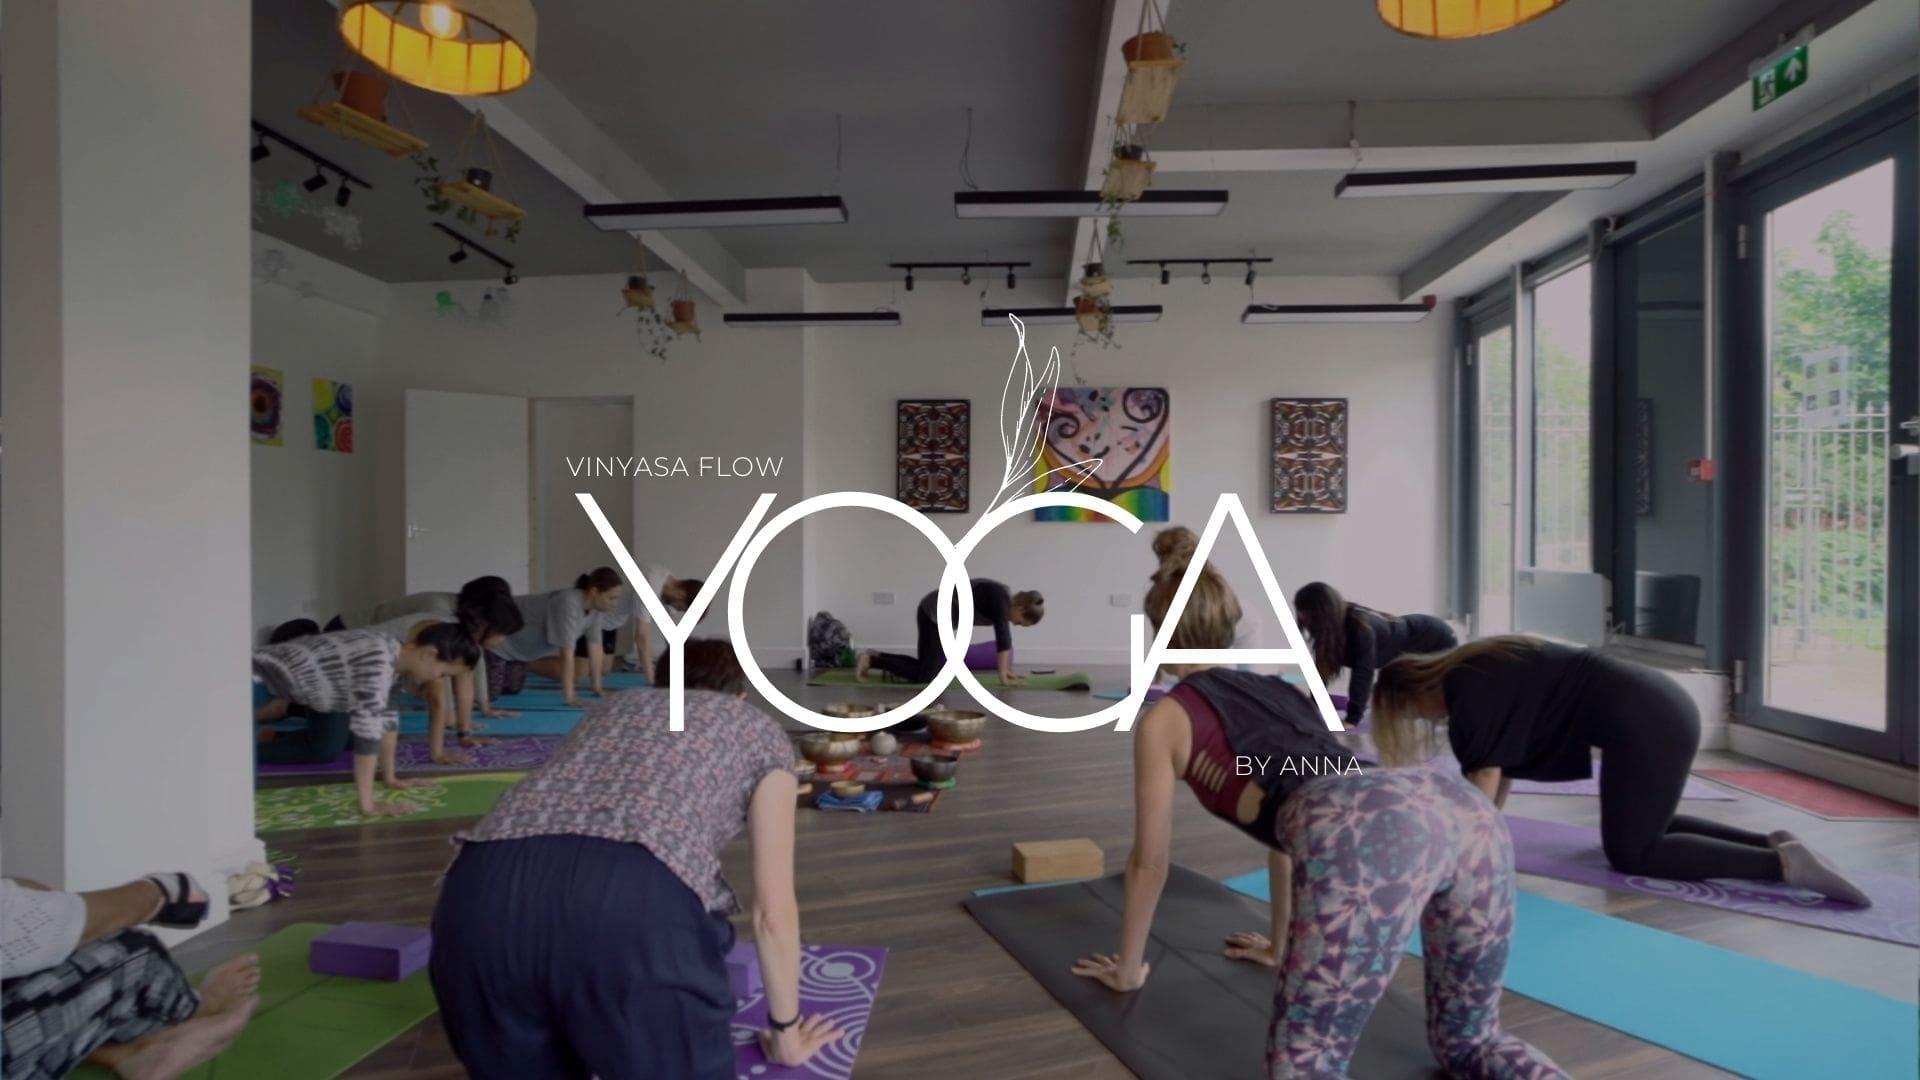 Vinyasa Flow Yoga Hackney Wick London